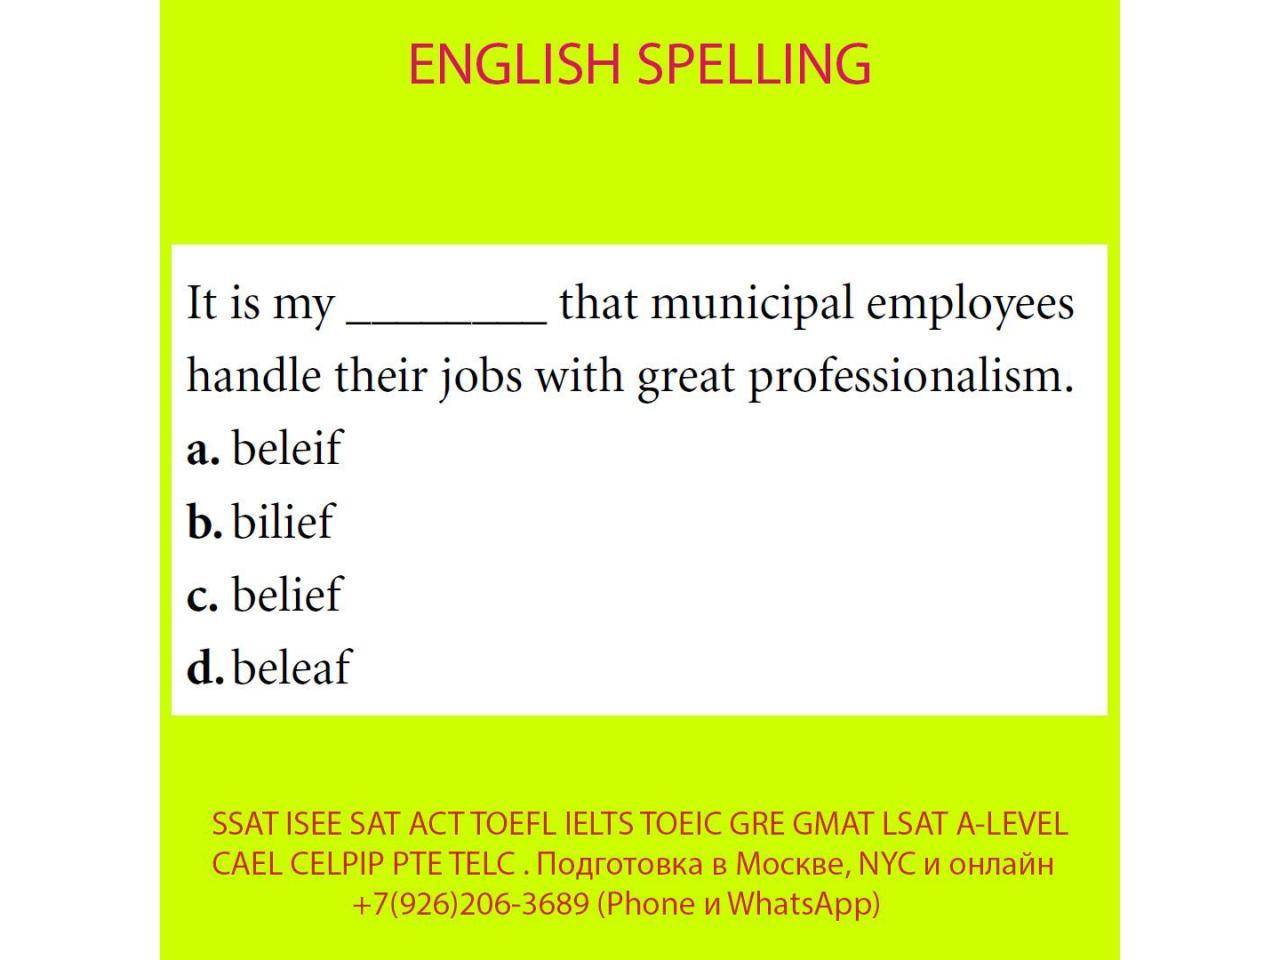 Курсы SSAT, ISEE, SAT, ACT, TOEFL, TOEIC преподаватель, репетитор из США - 5